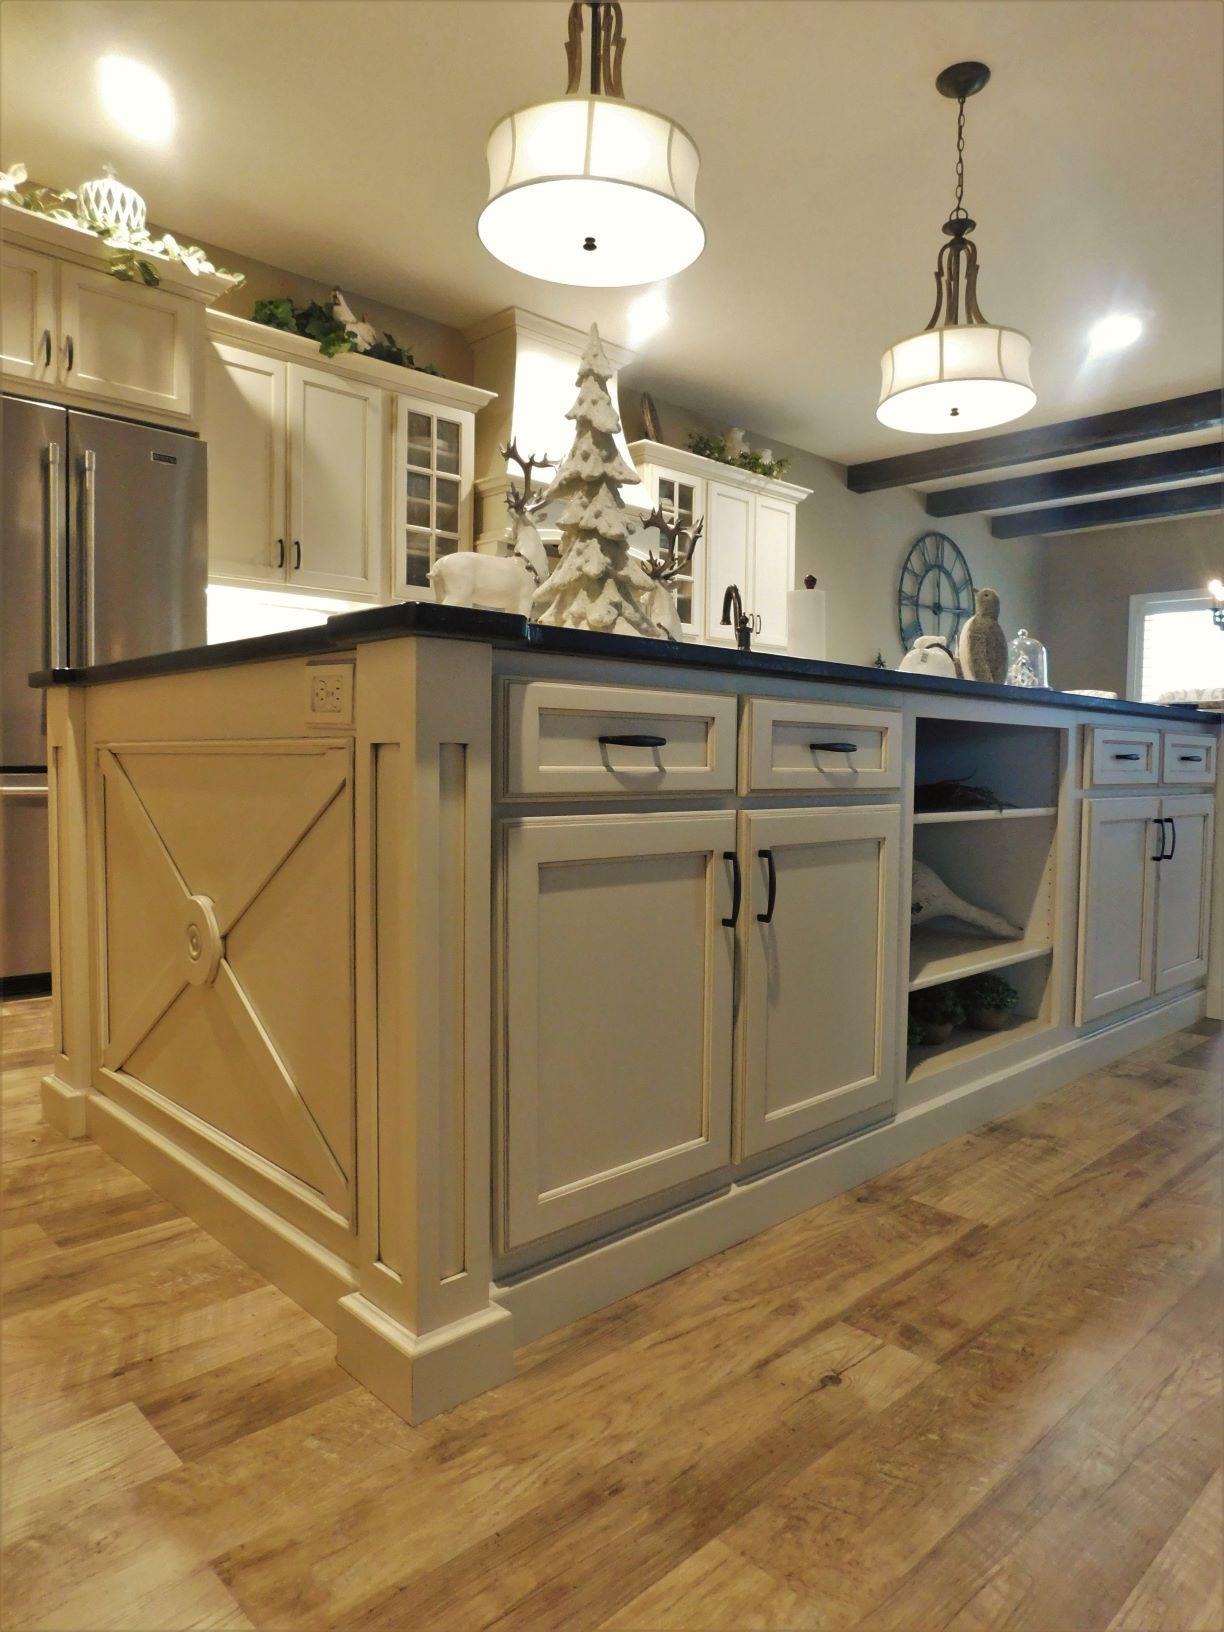 Laker Hardware Flooring And Interior Design